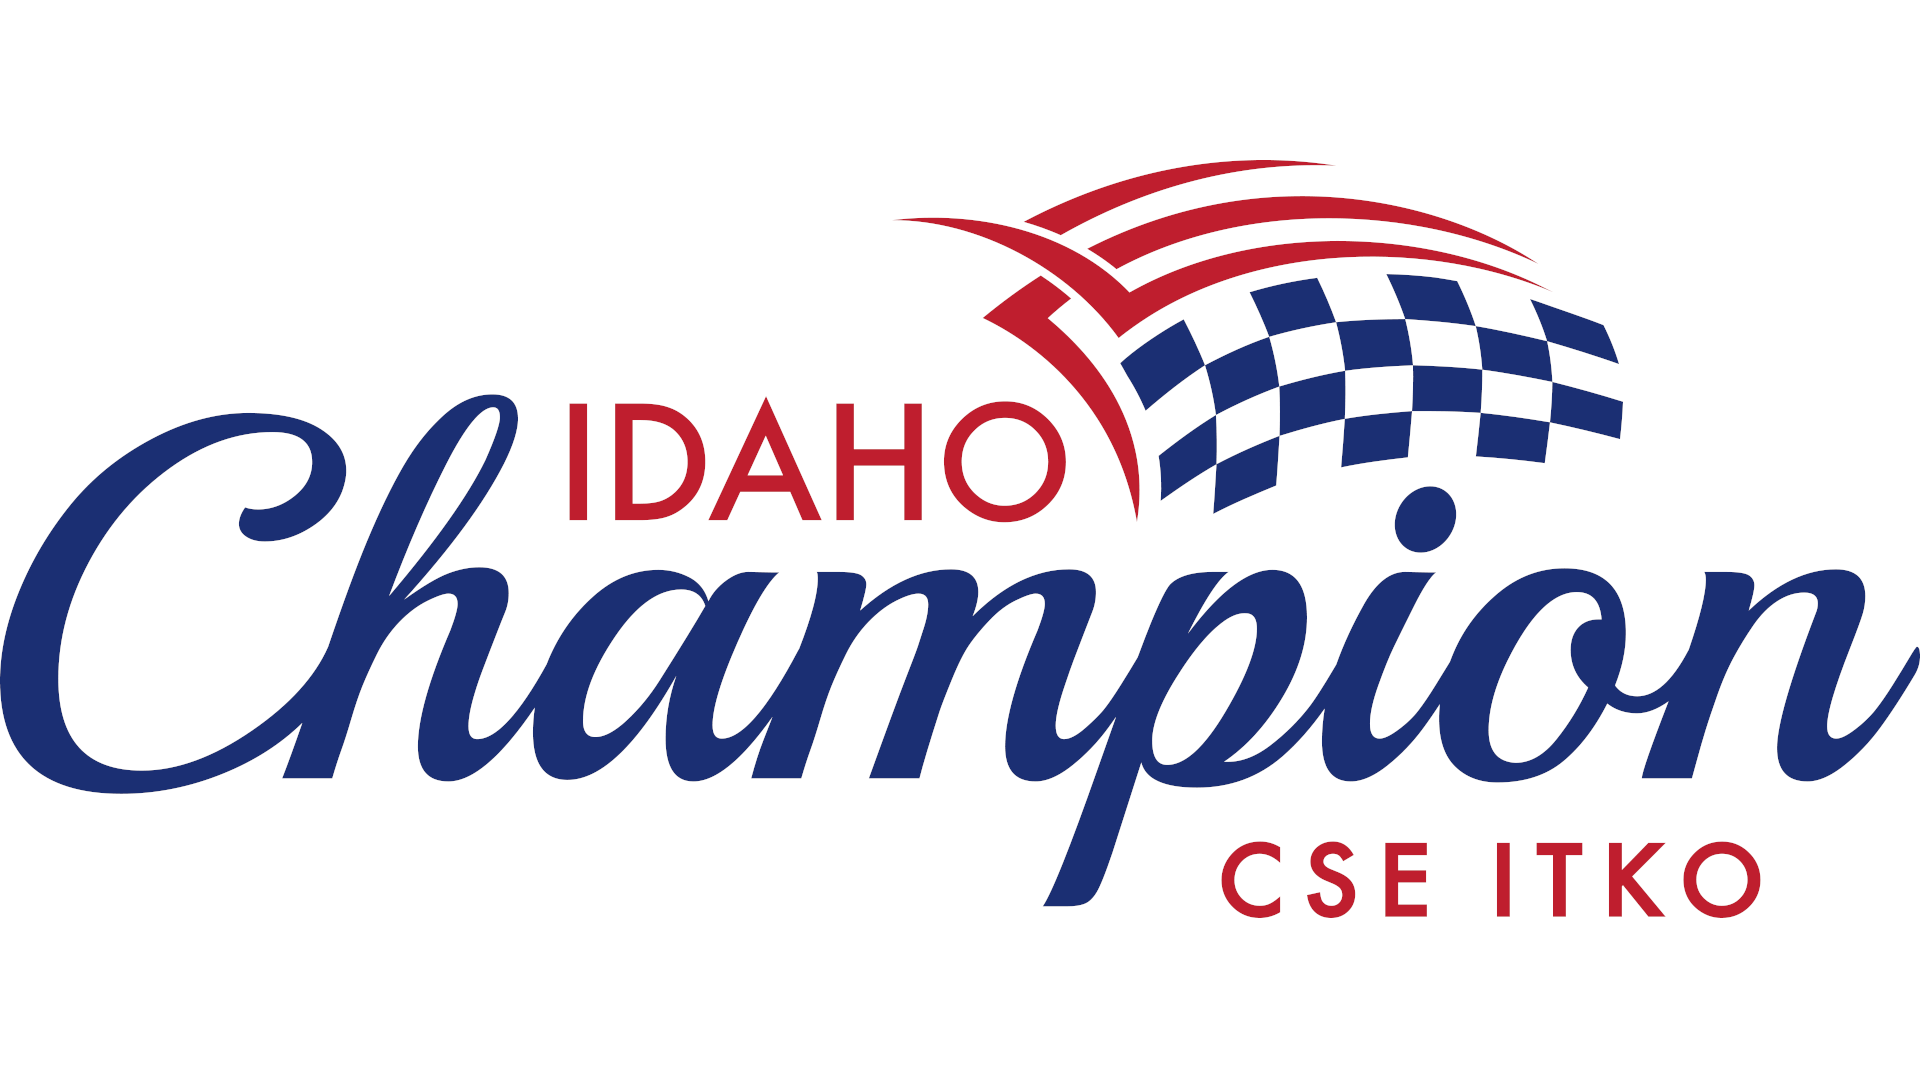 Idaho Champion Gold Invites Shareholders to Attend Virtual AGM